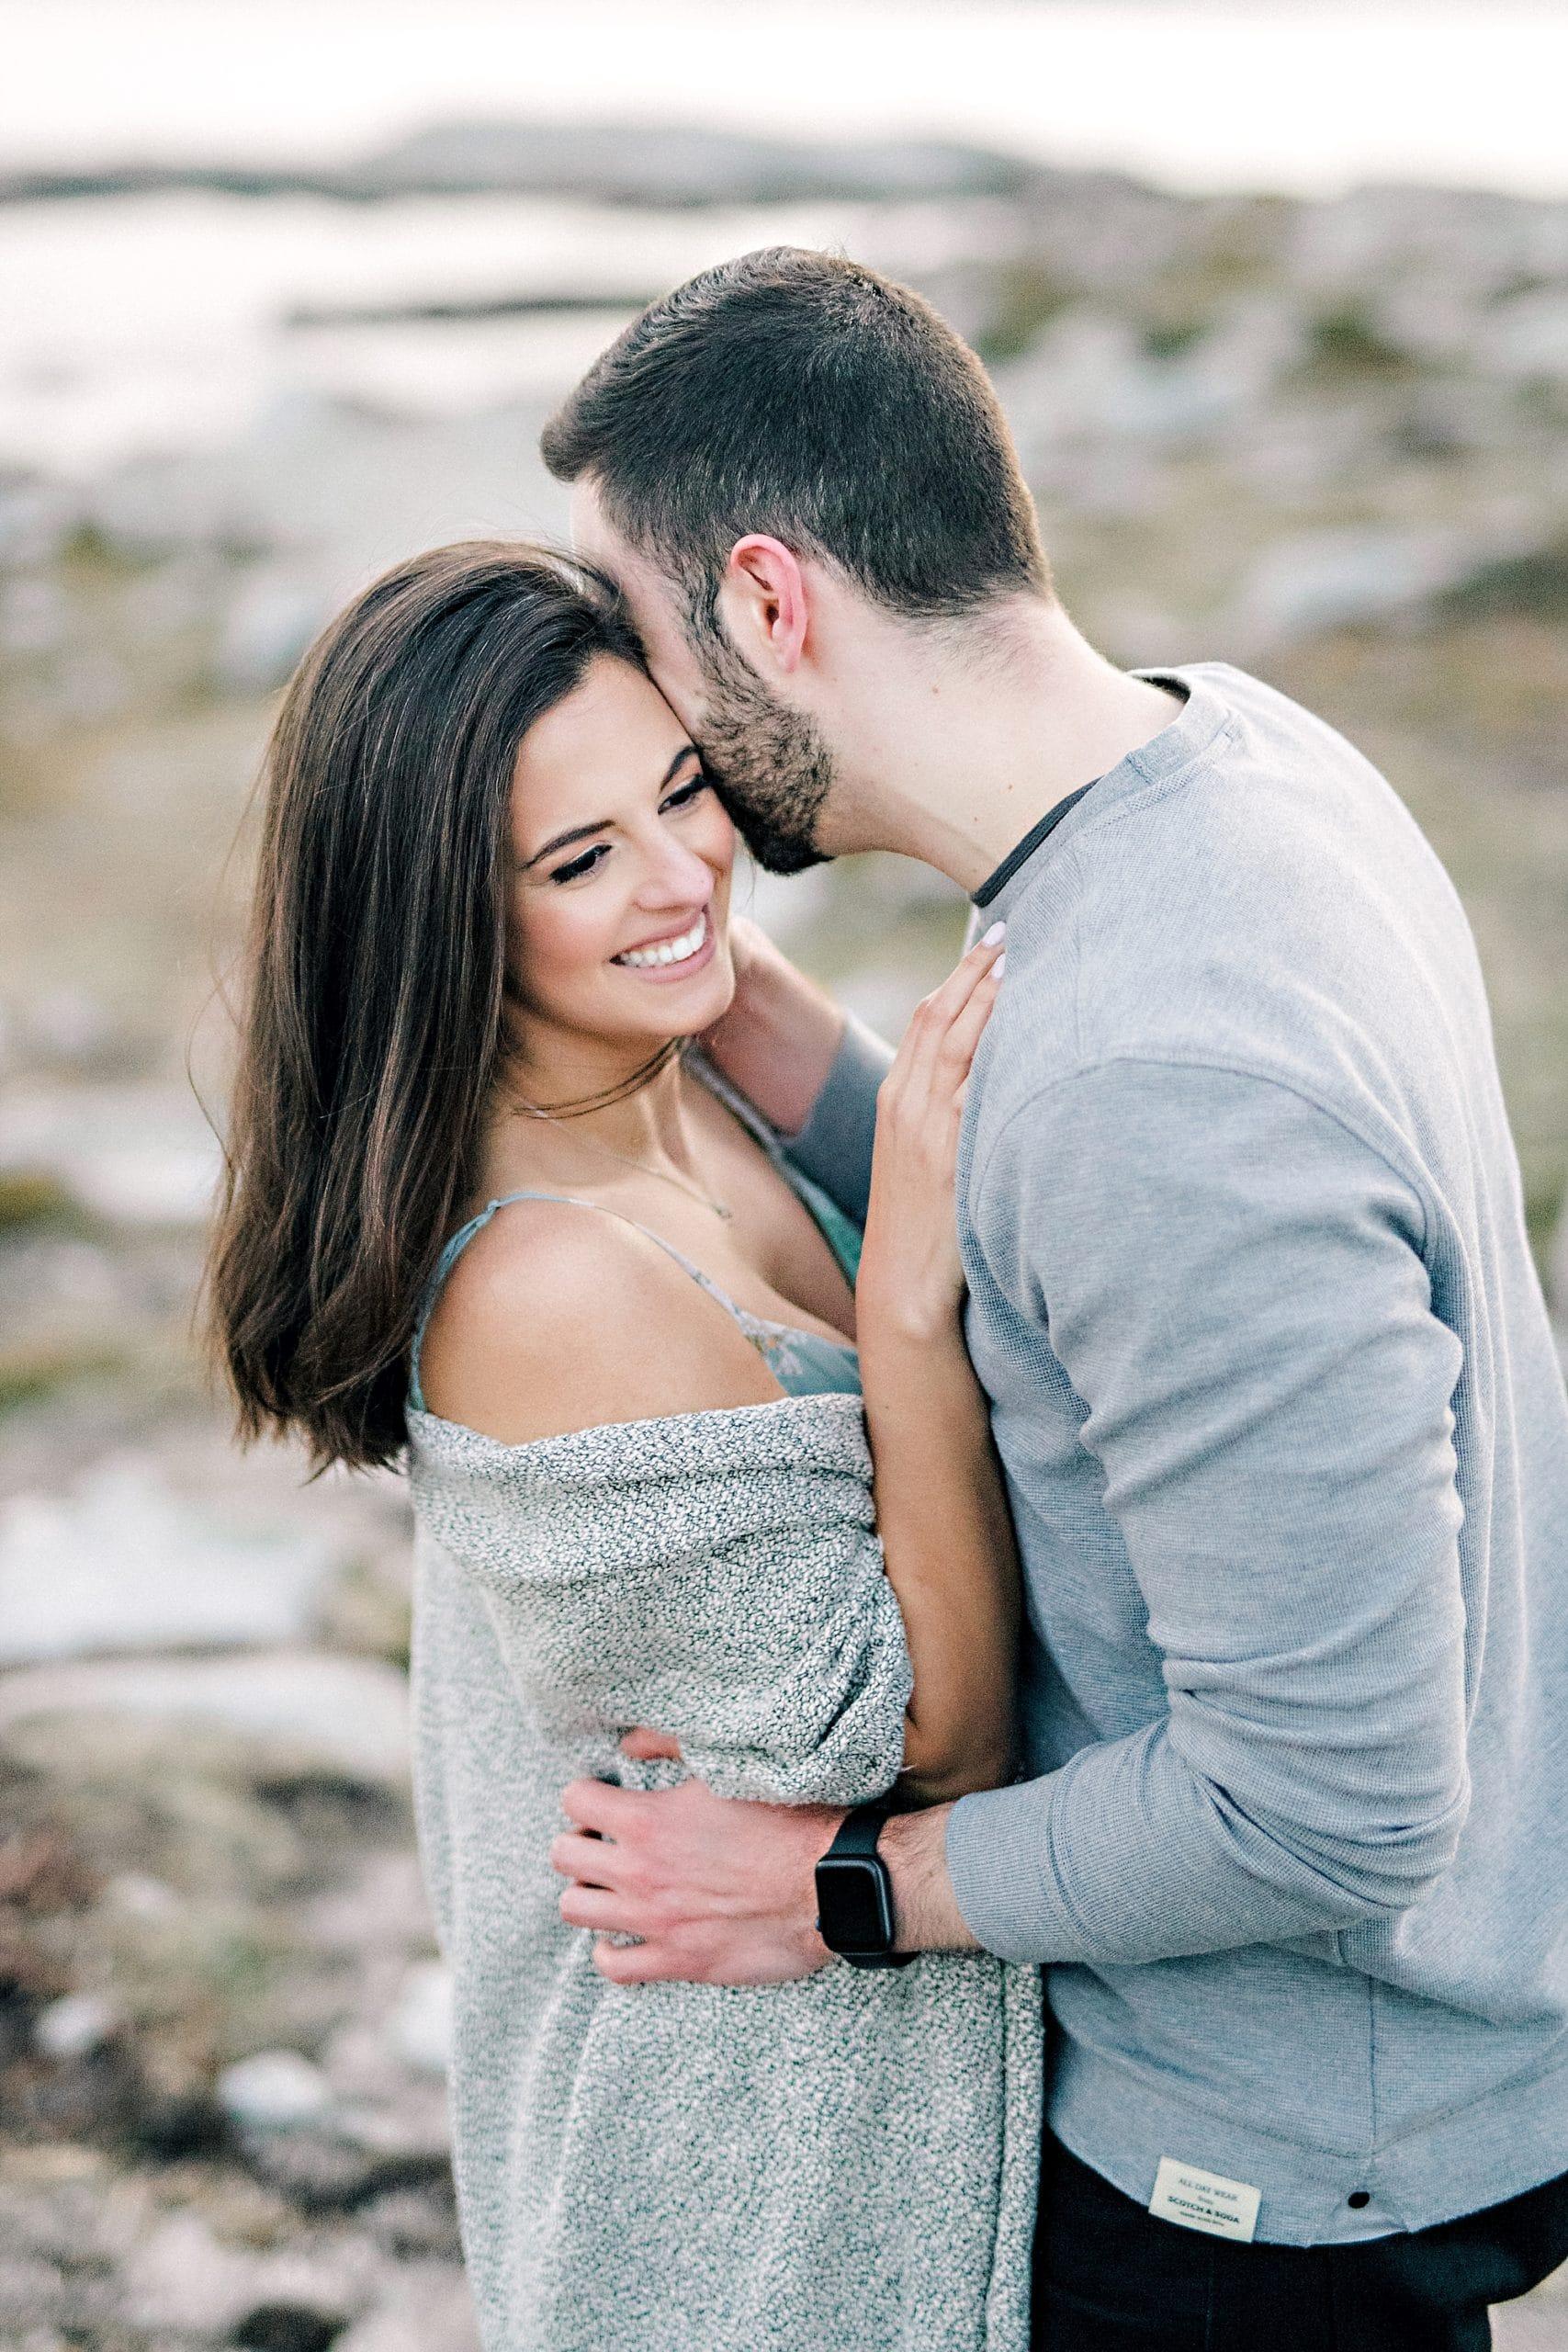 guy kissing girlfriends cheek